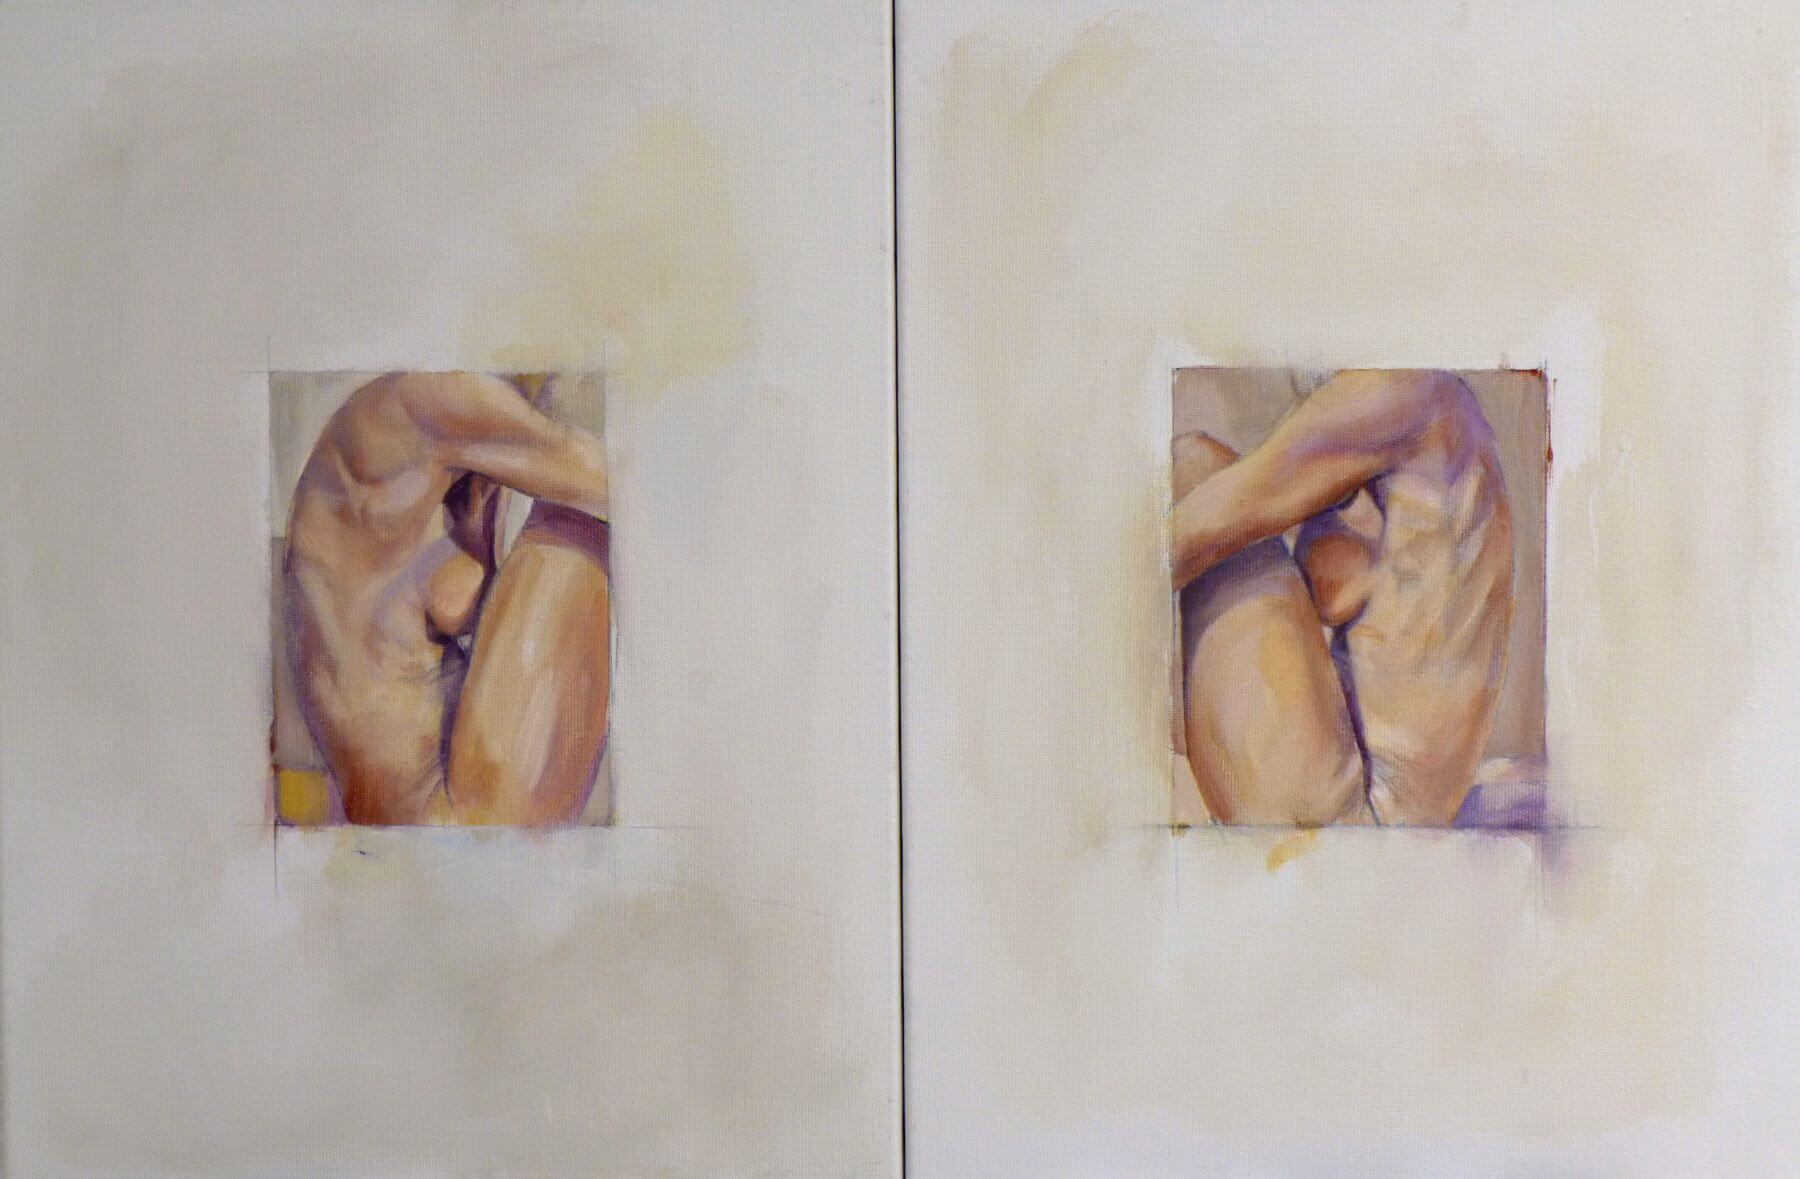 Figurine - painting, acrylic on canvas by artist Neva Bergemann